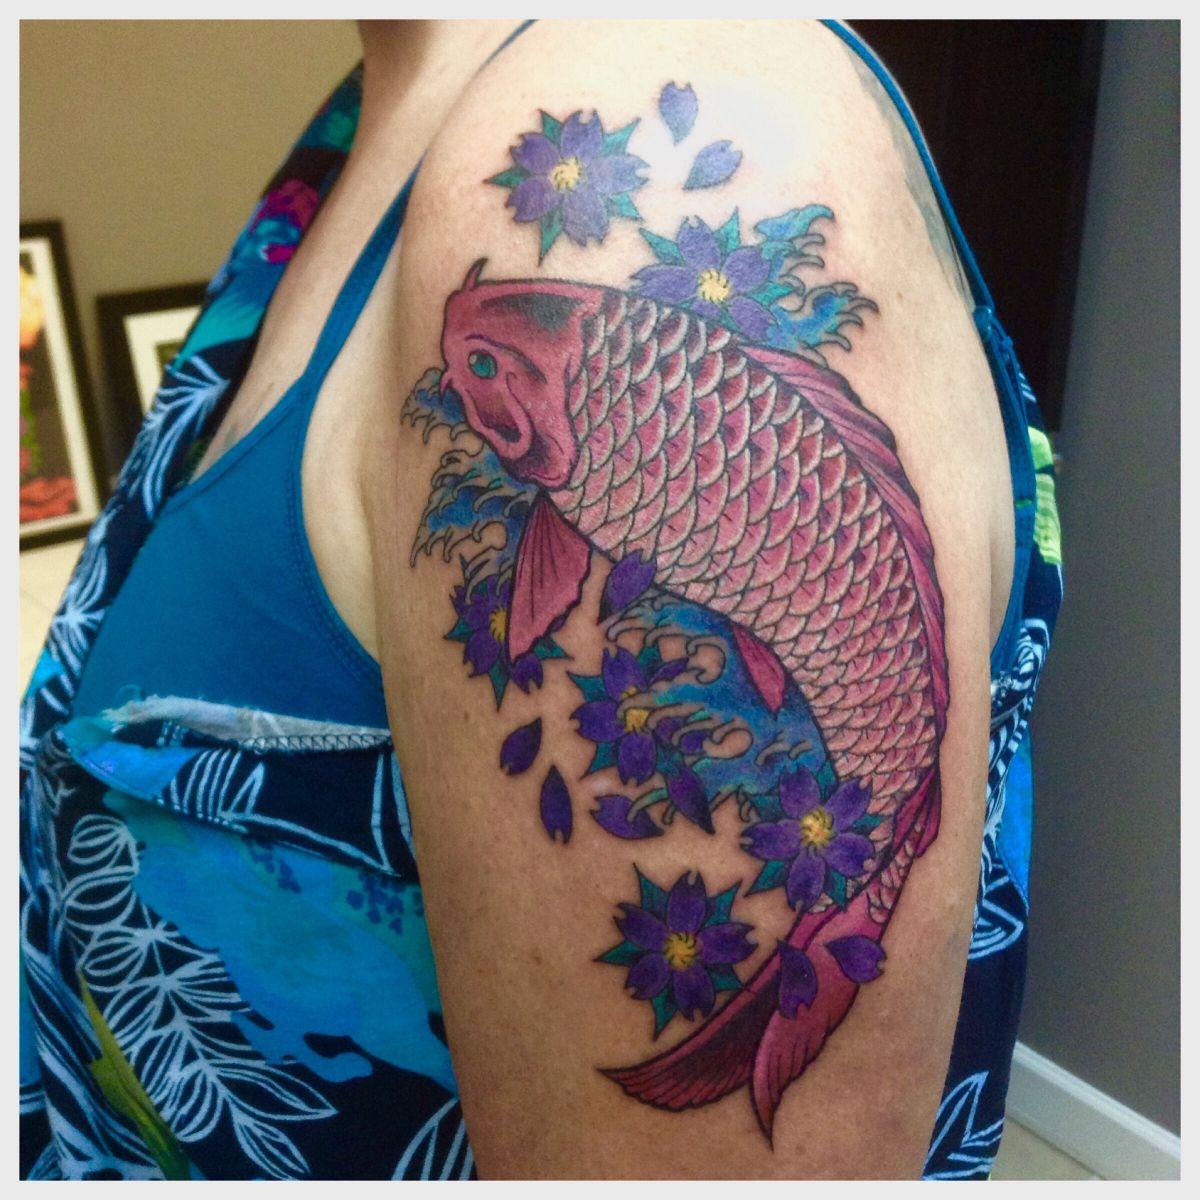 Koi fish tattoo by Cat